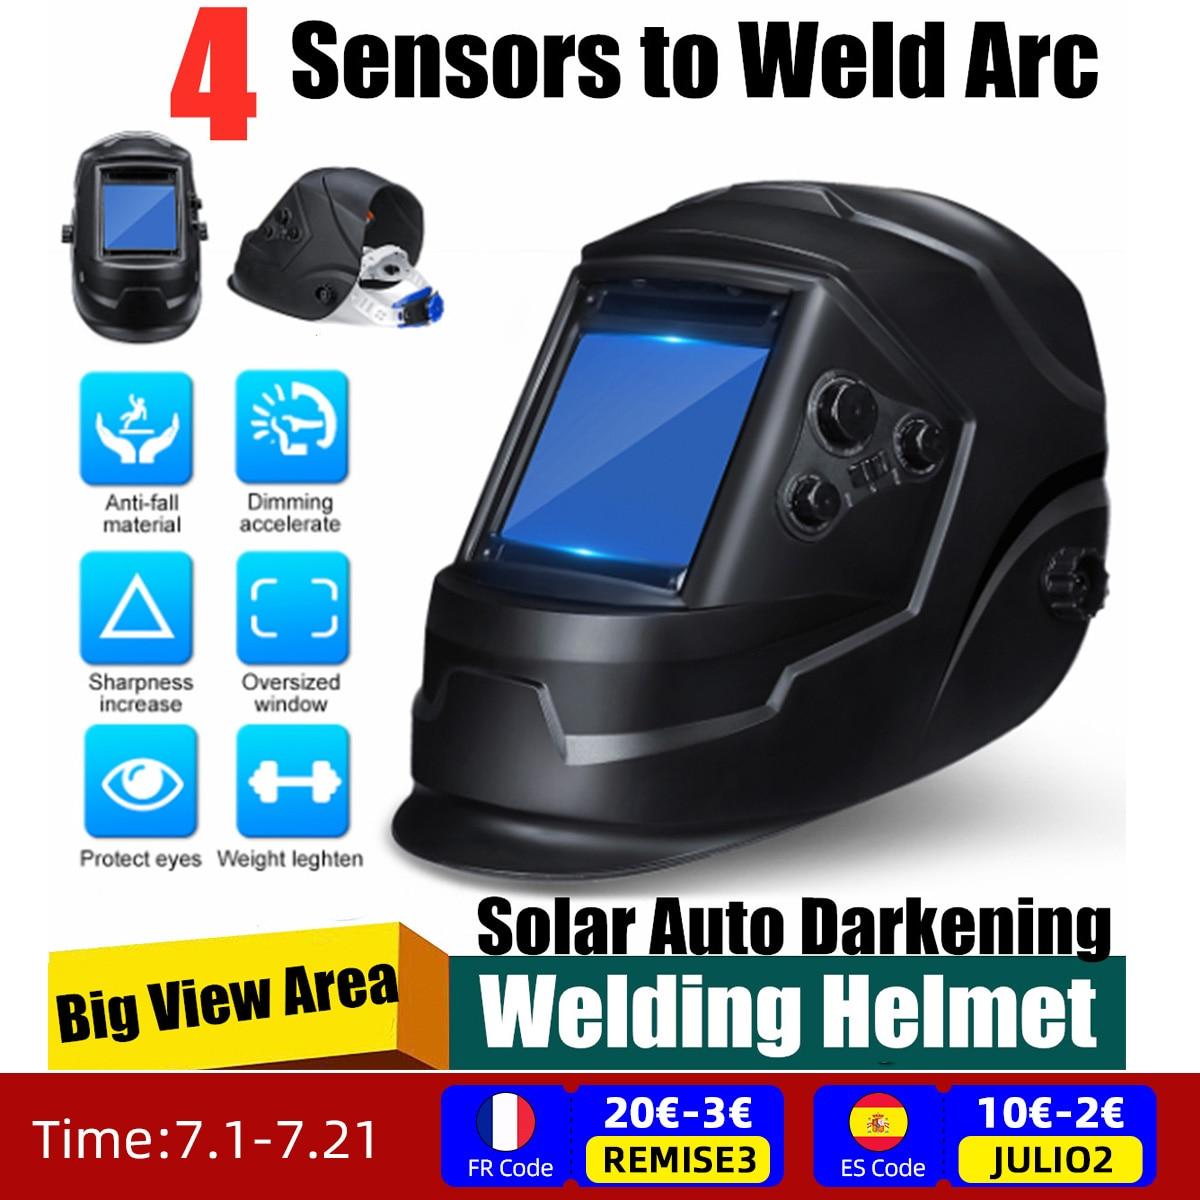 TIG MIG MMA قناع لحام خوذة لحام غطاء عدسة الوجه الطاقة الشمسية السيارات سواد لحام خوذة عرض كبير 4 قوس الاستشعار DIN5-DIN13